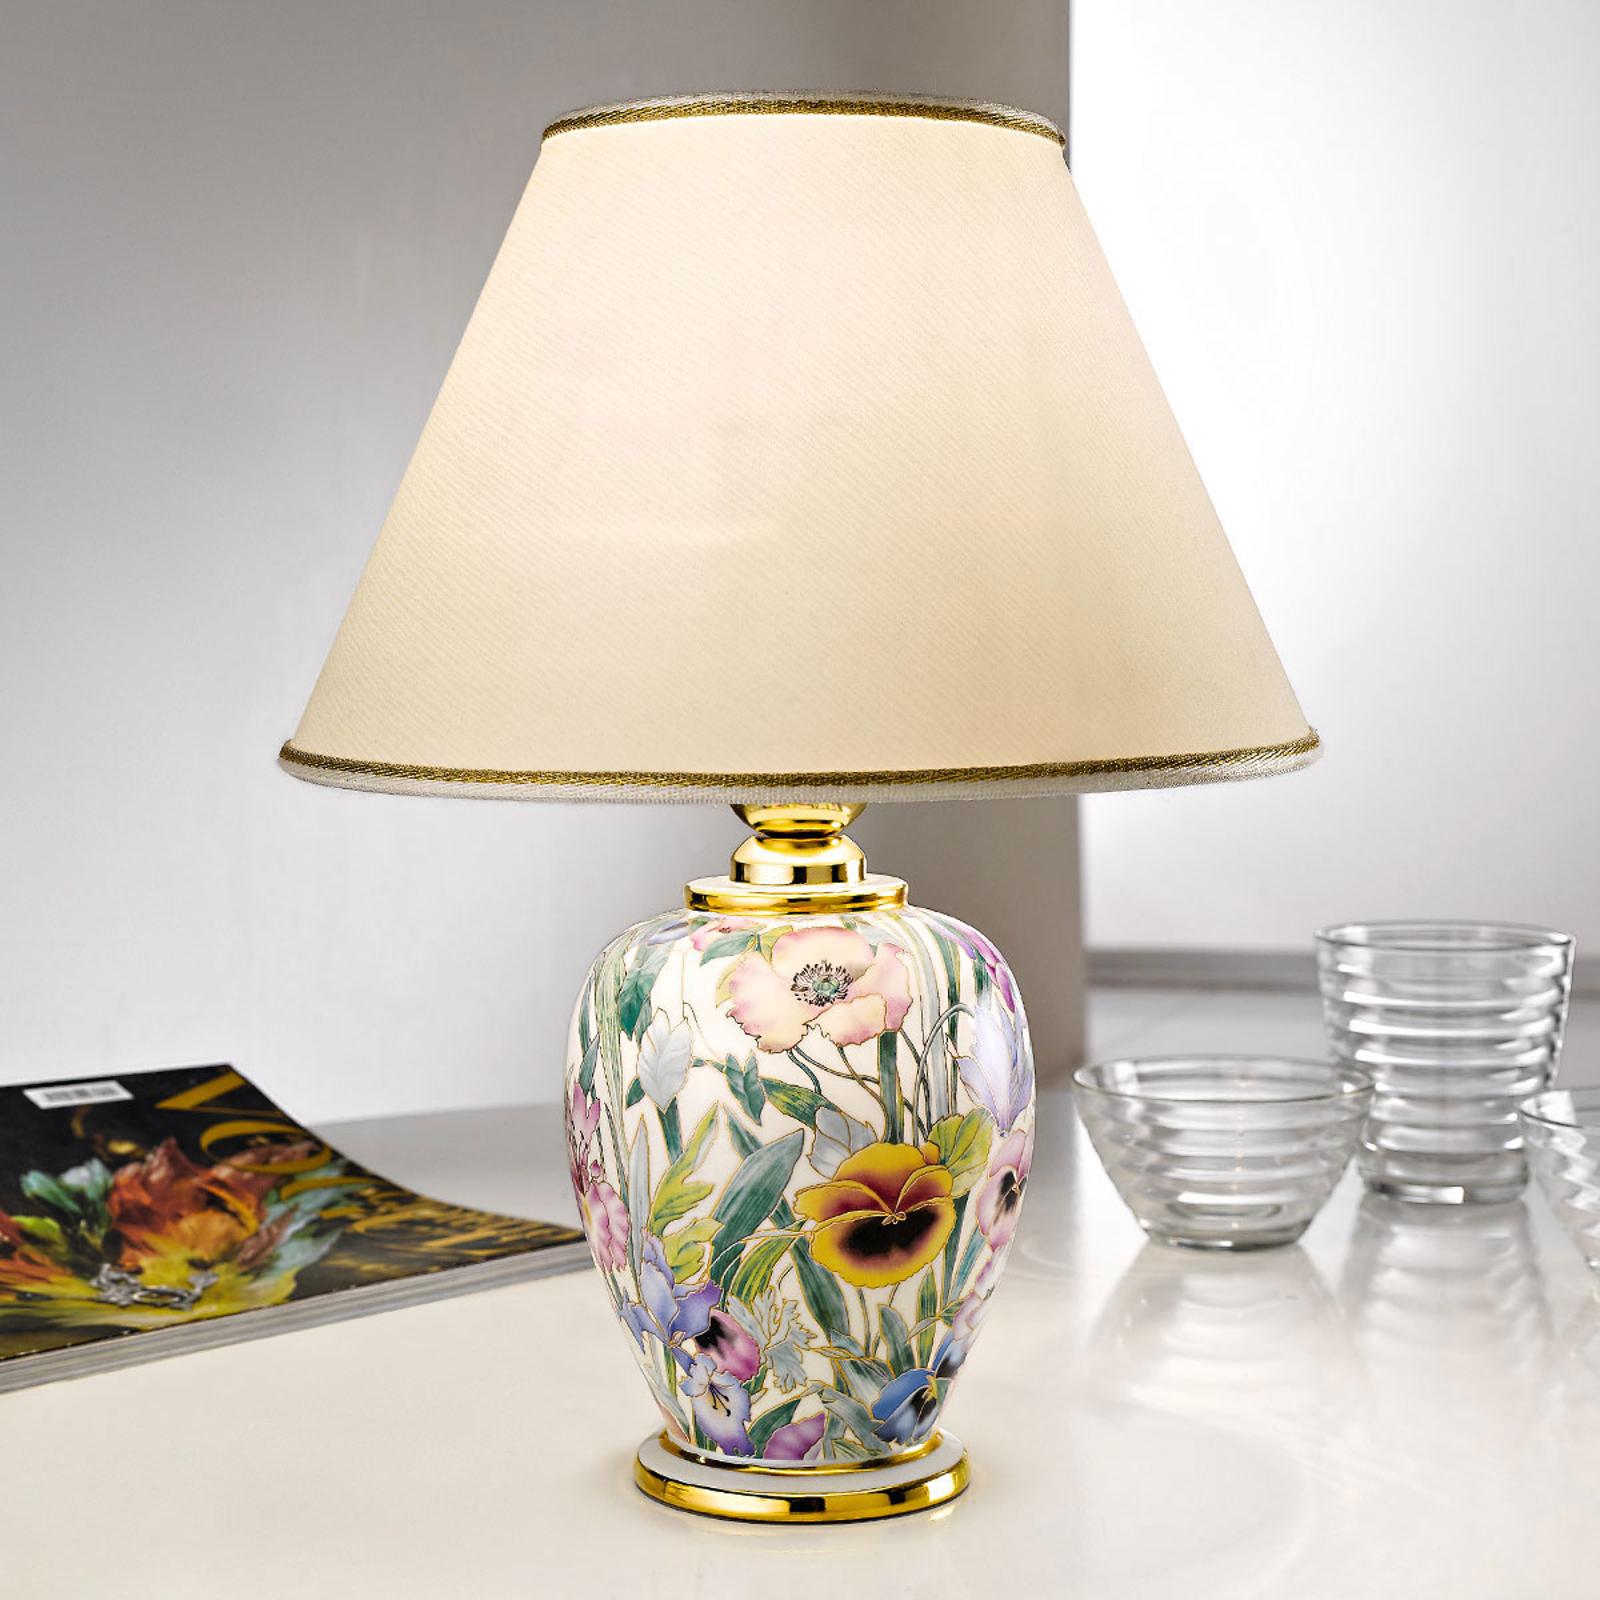 Lampa stołowa Giardino Panse kwiatowy nadruk Ø25cm